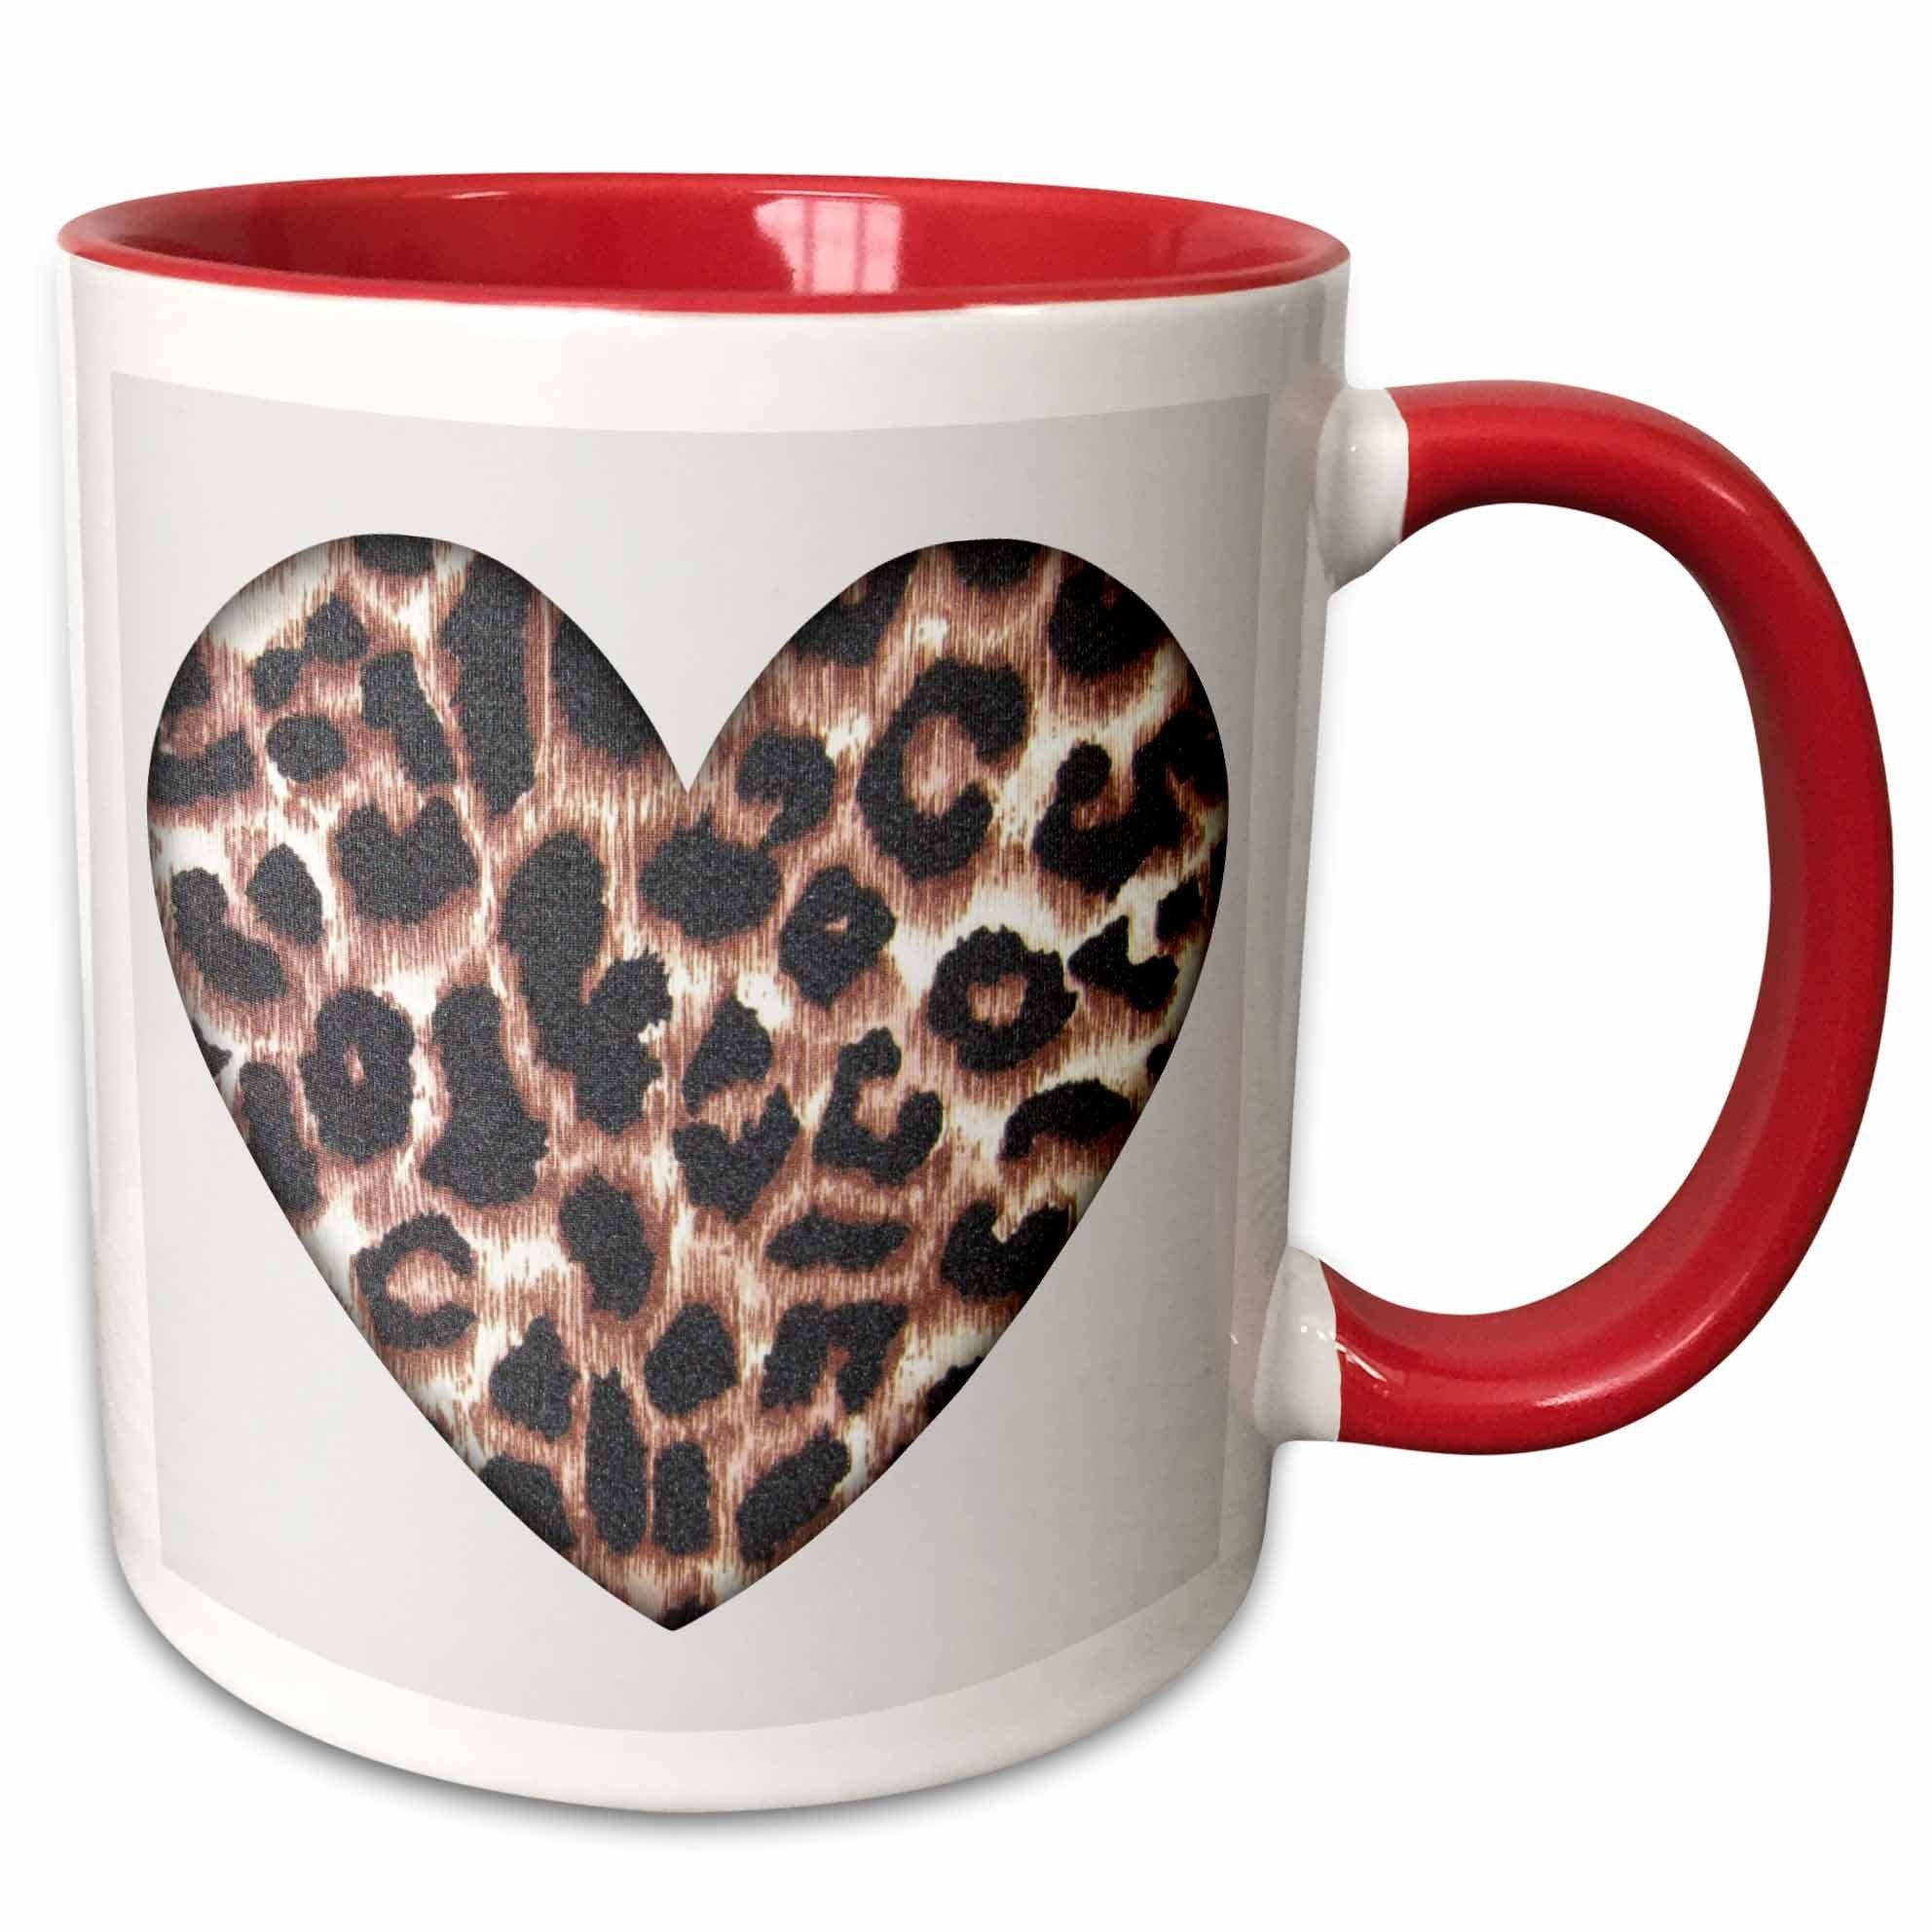 3dRose mug_30870_5 Heart Leopard Animal Prints Fashion Ceramic, 11 oz, Red/White